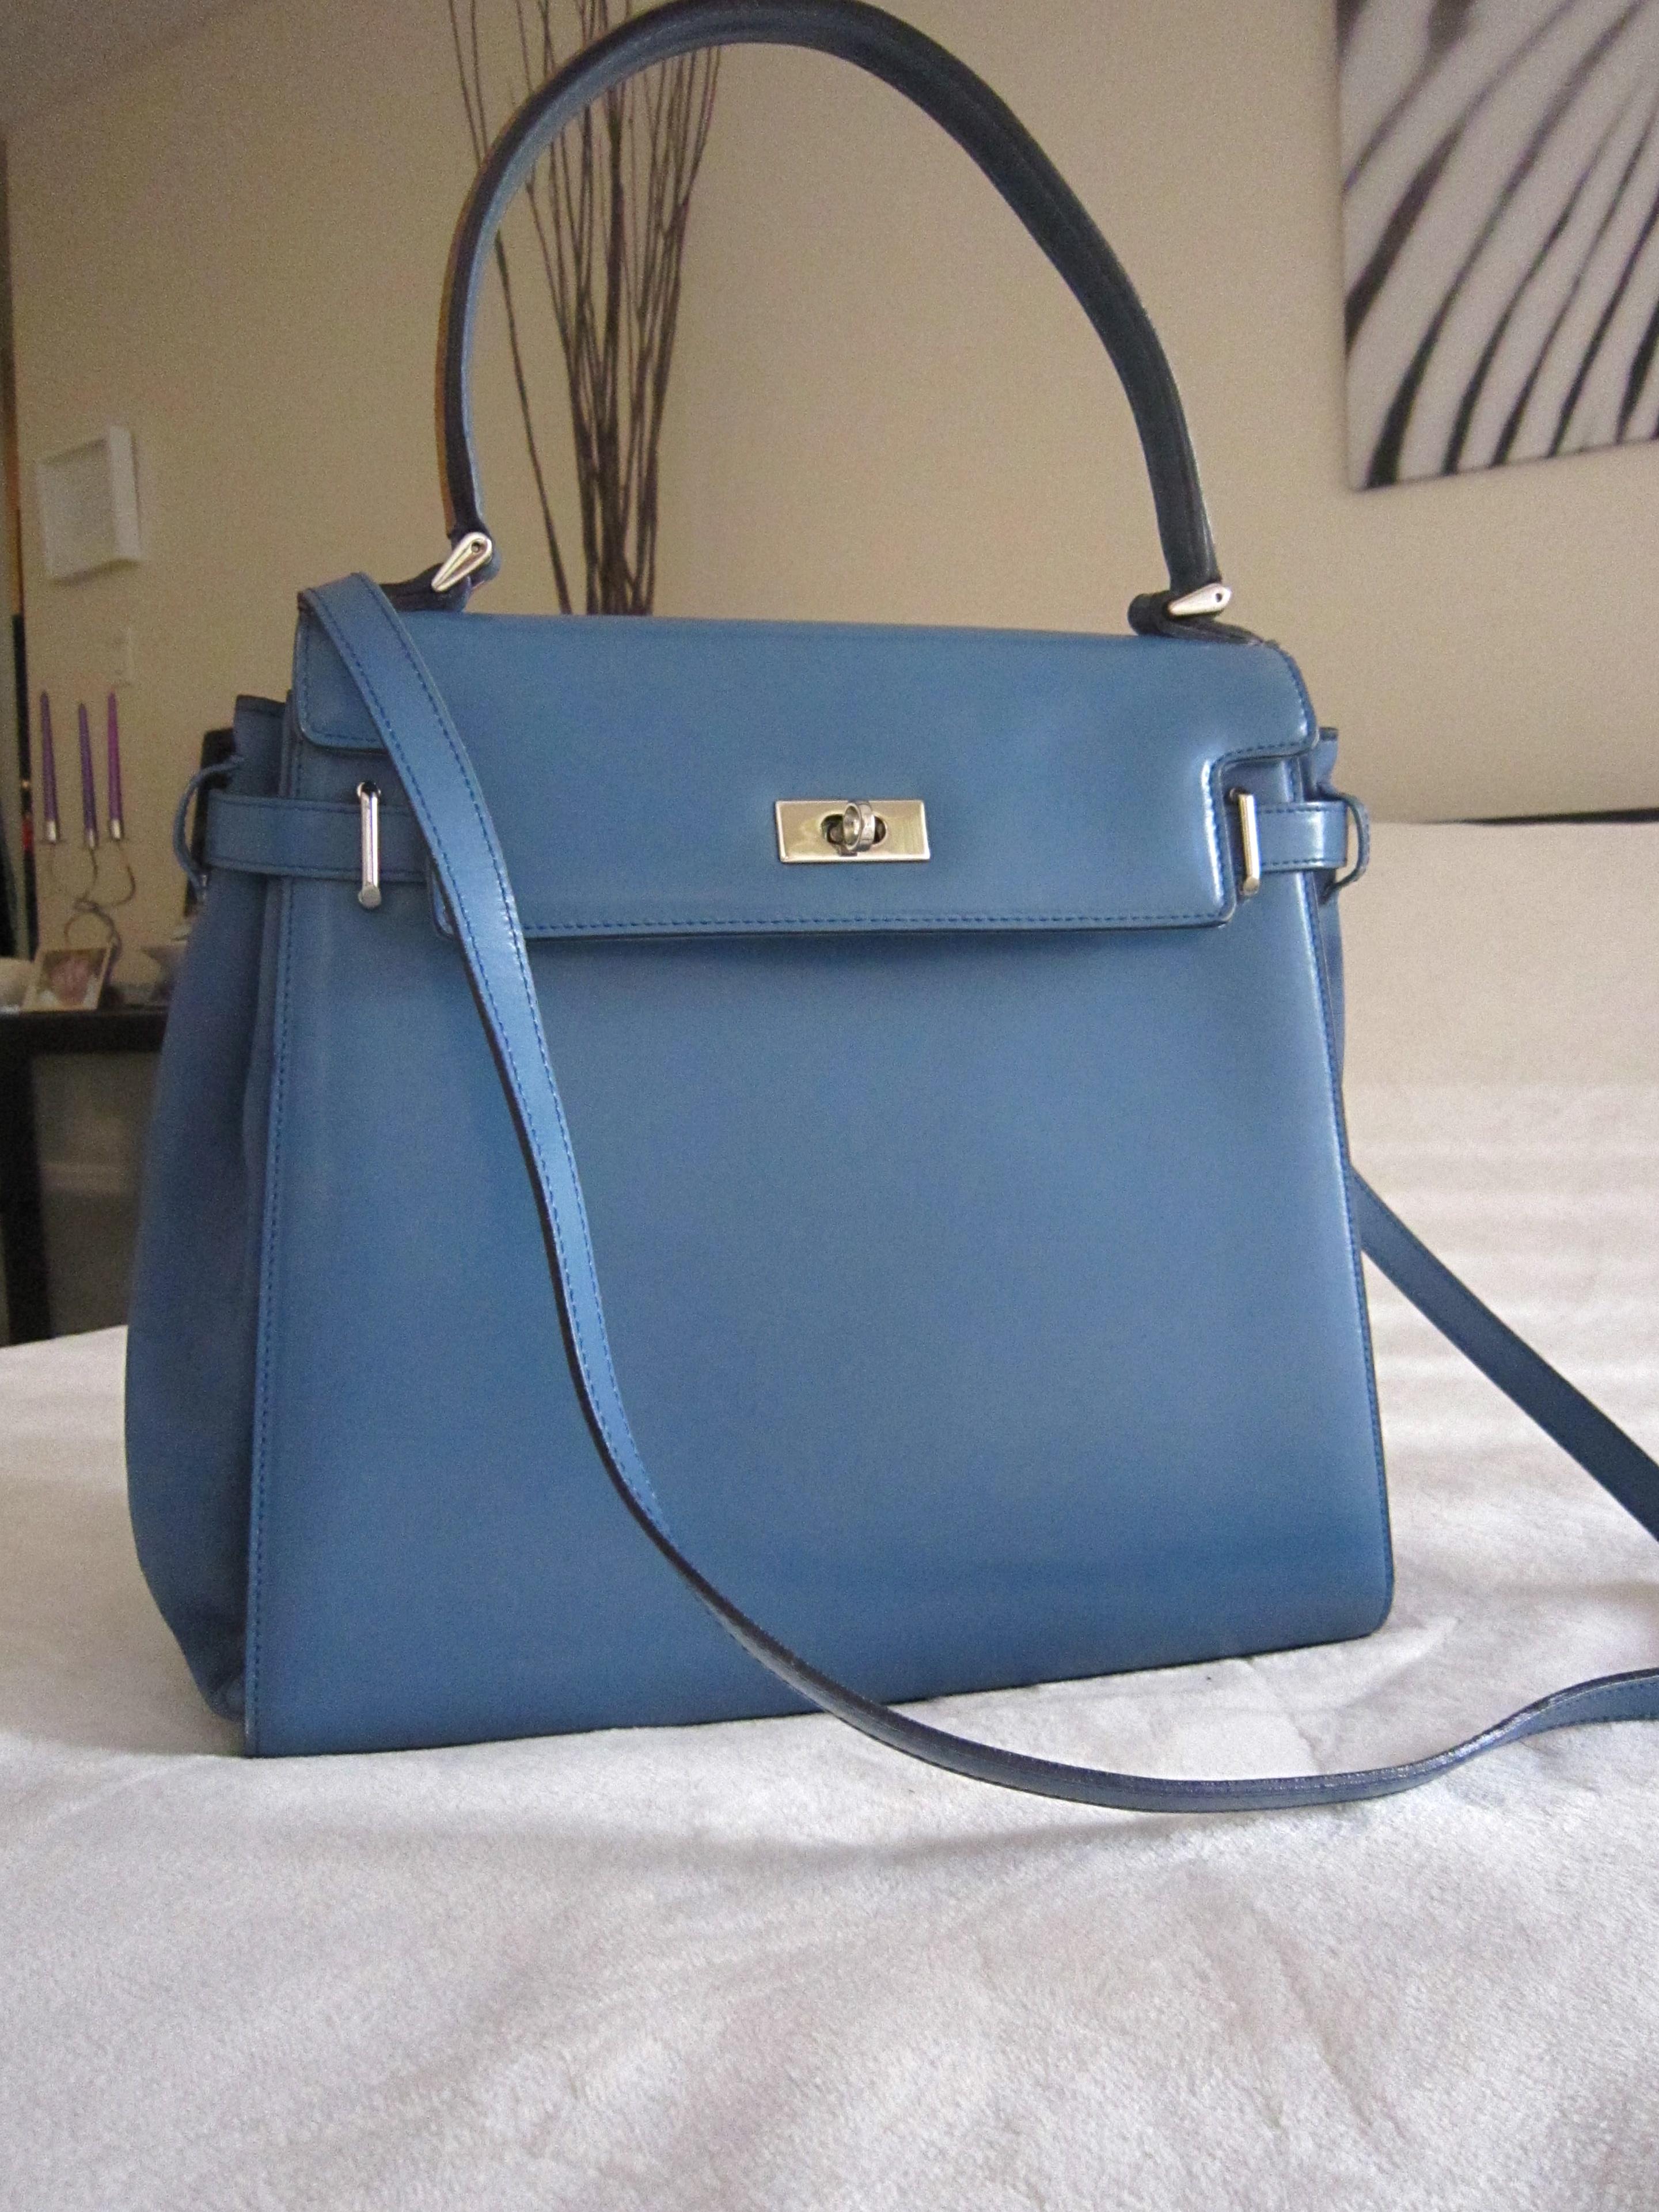 A Testoni Blue Satchel Signature Leather Handbag 3